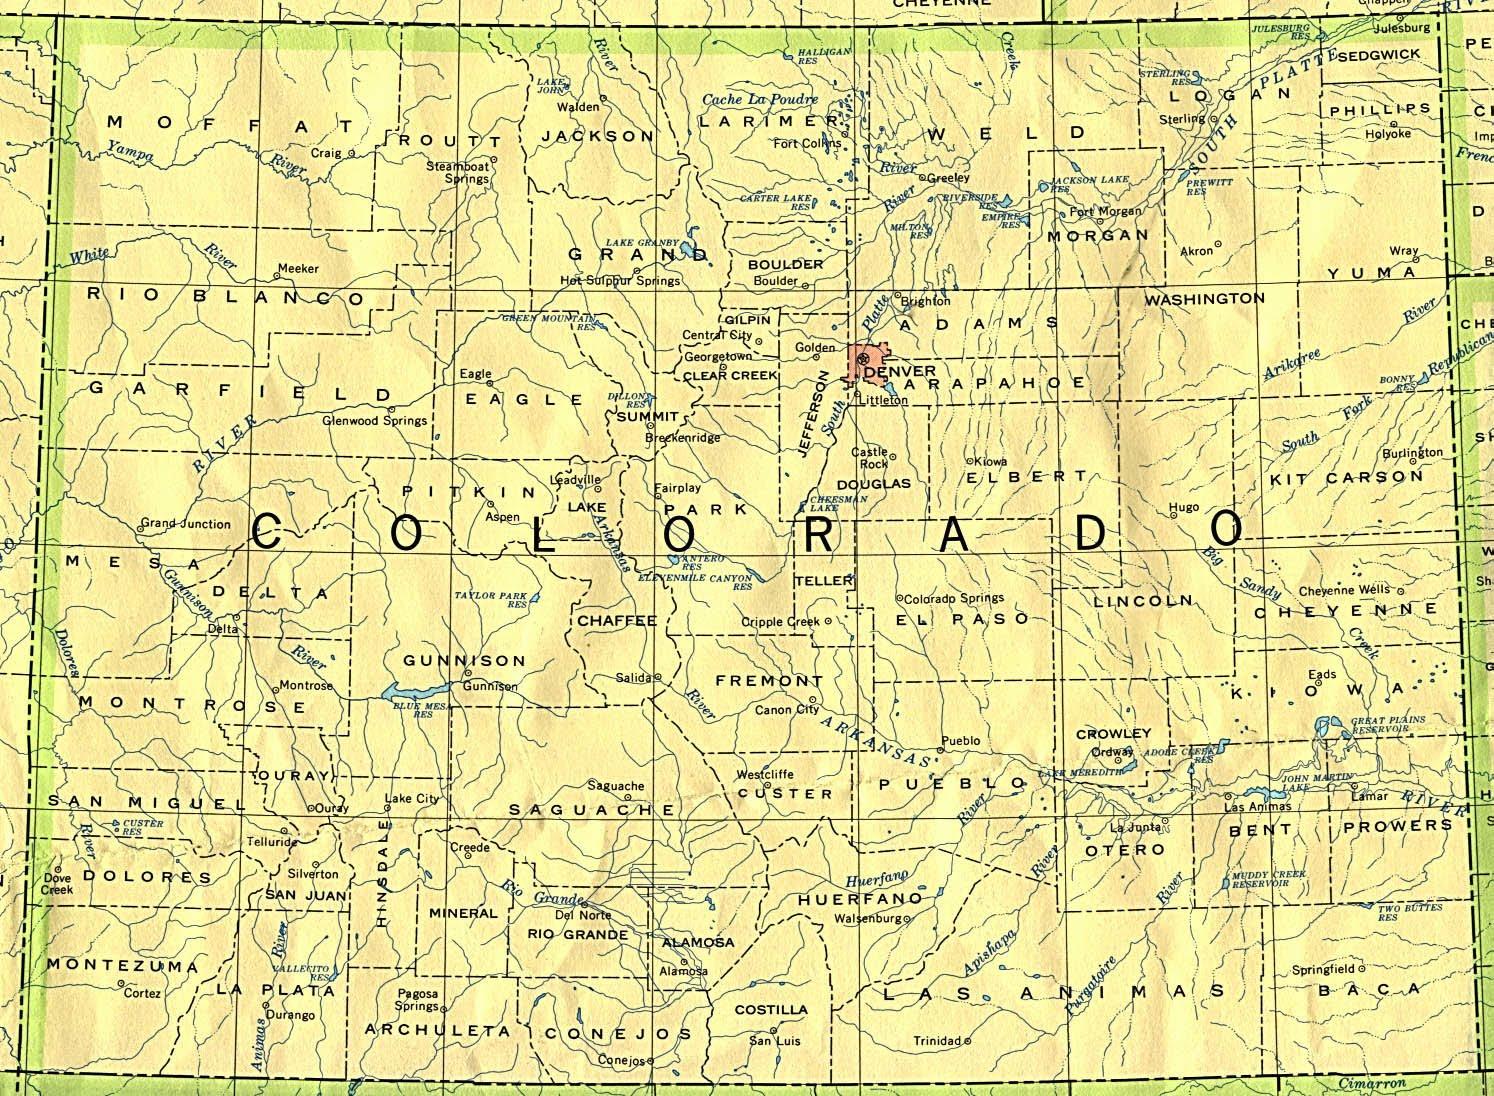 State bird lark bunting area codes 303 719 720 970 bordering states